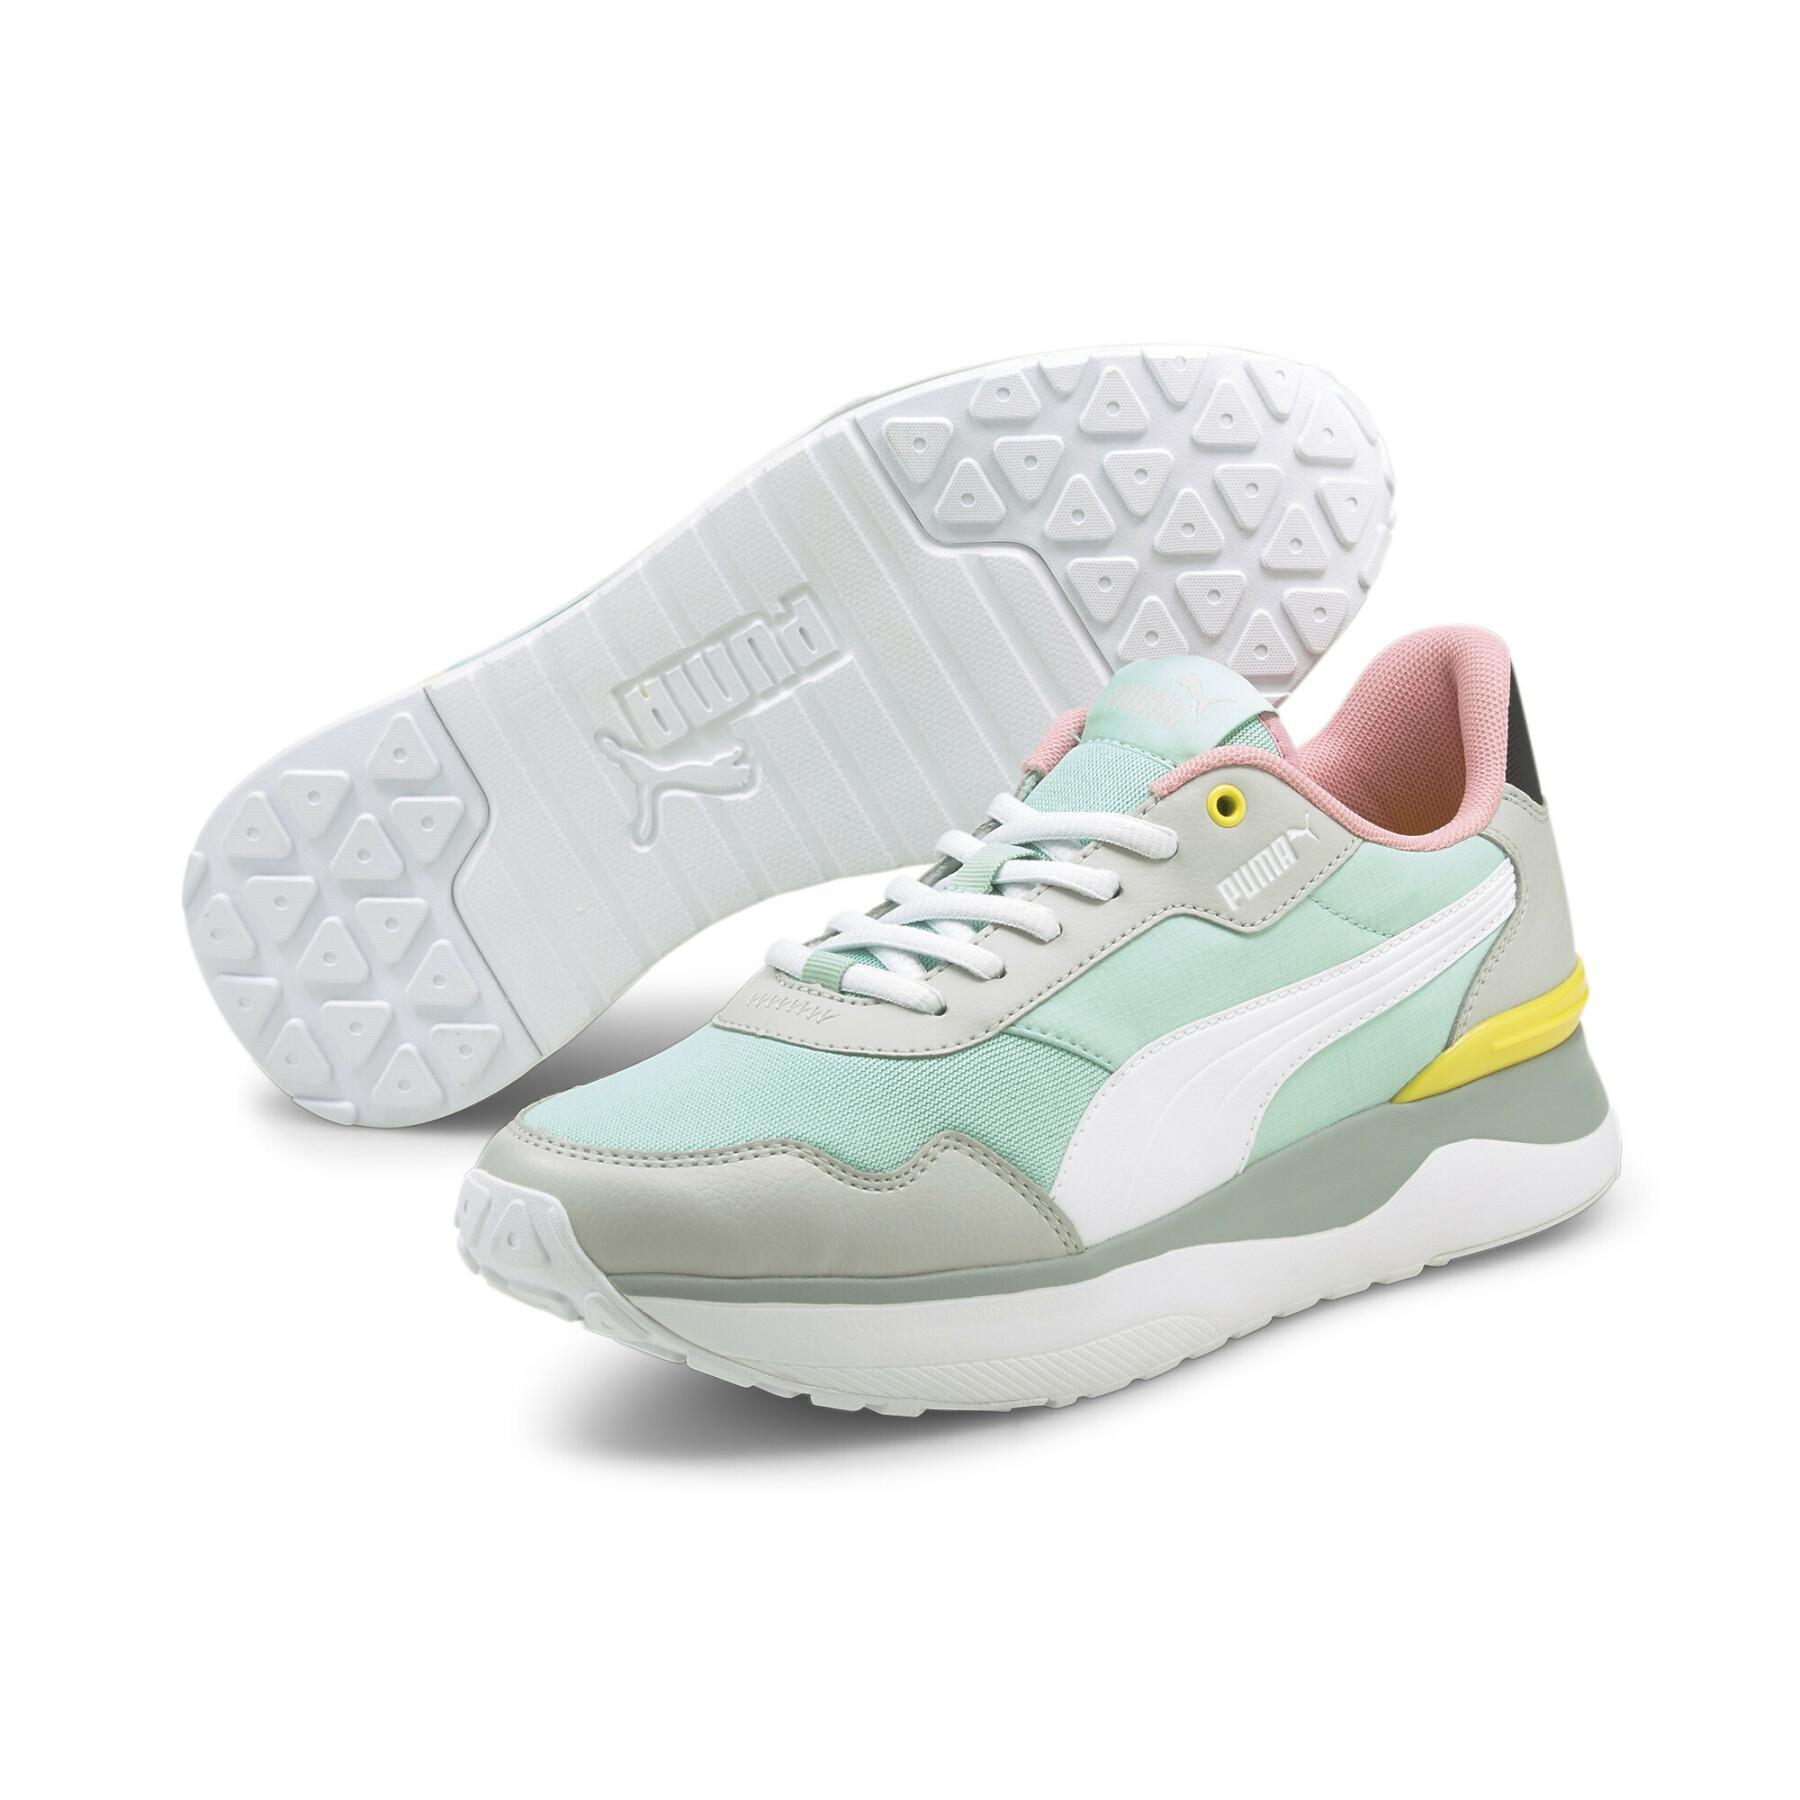 Women's sneakers Puma R78 Voyage